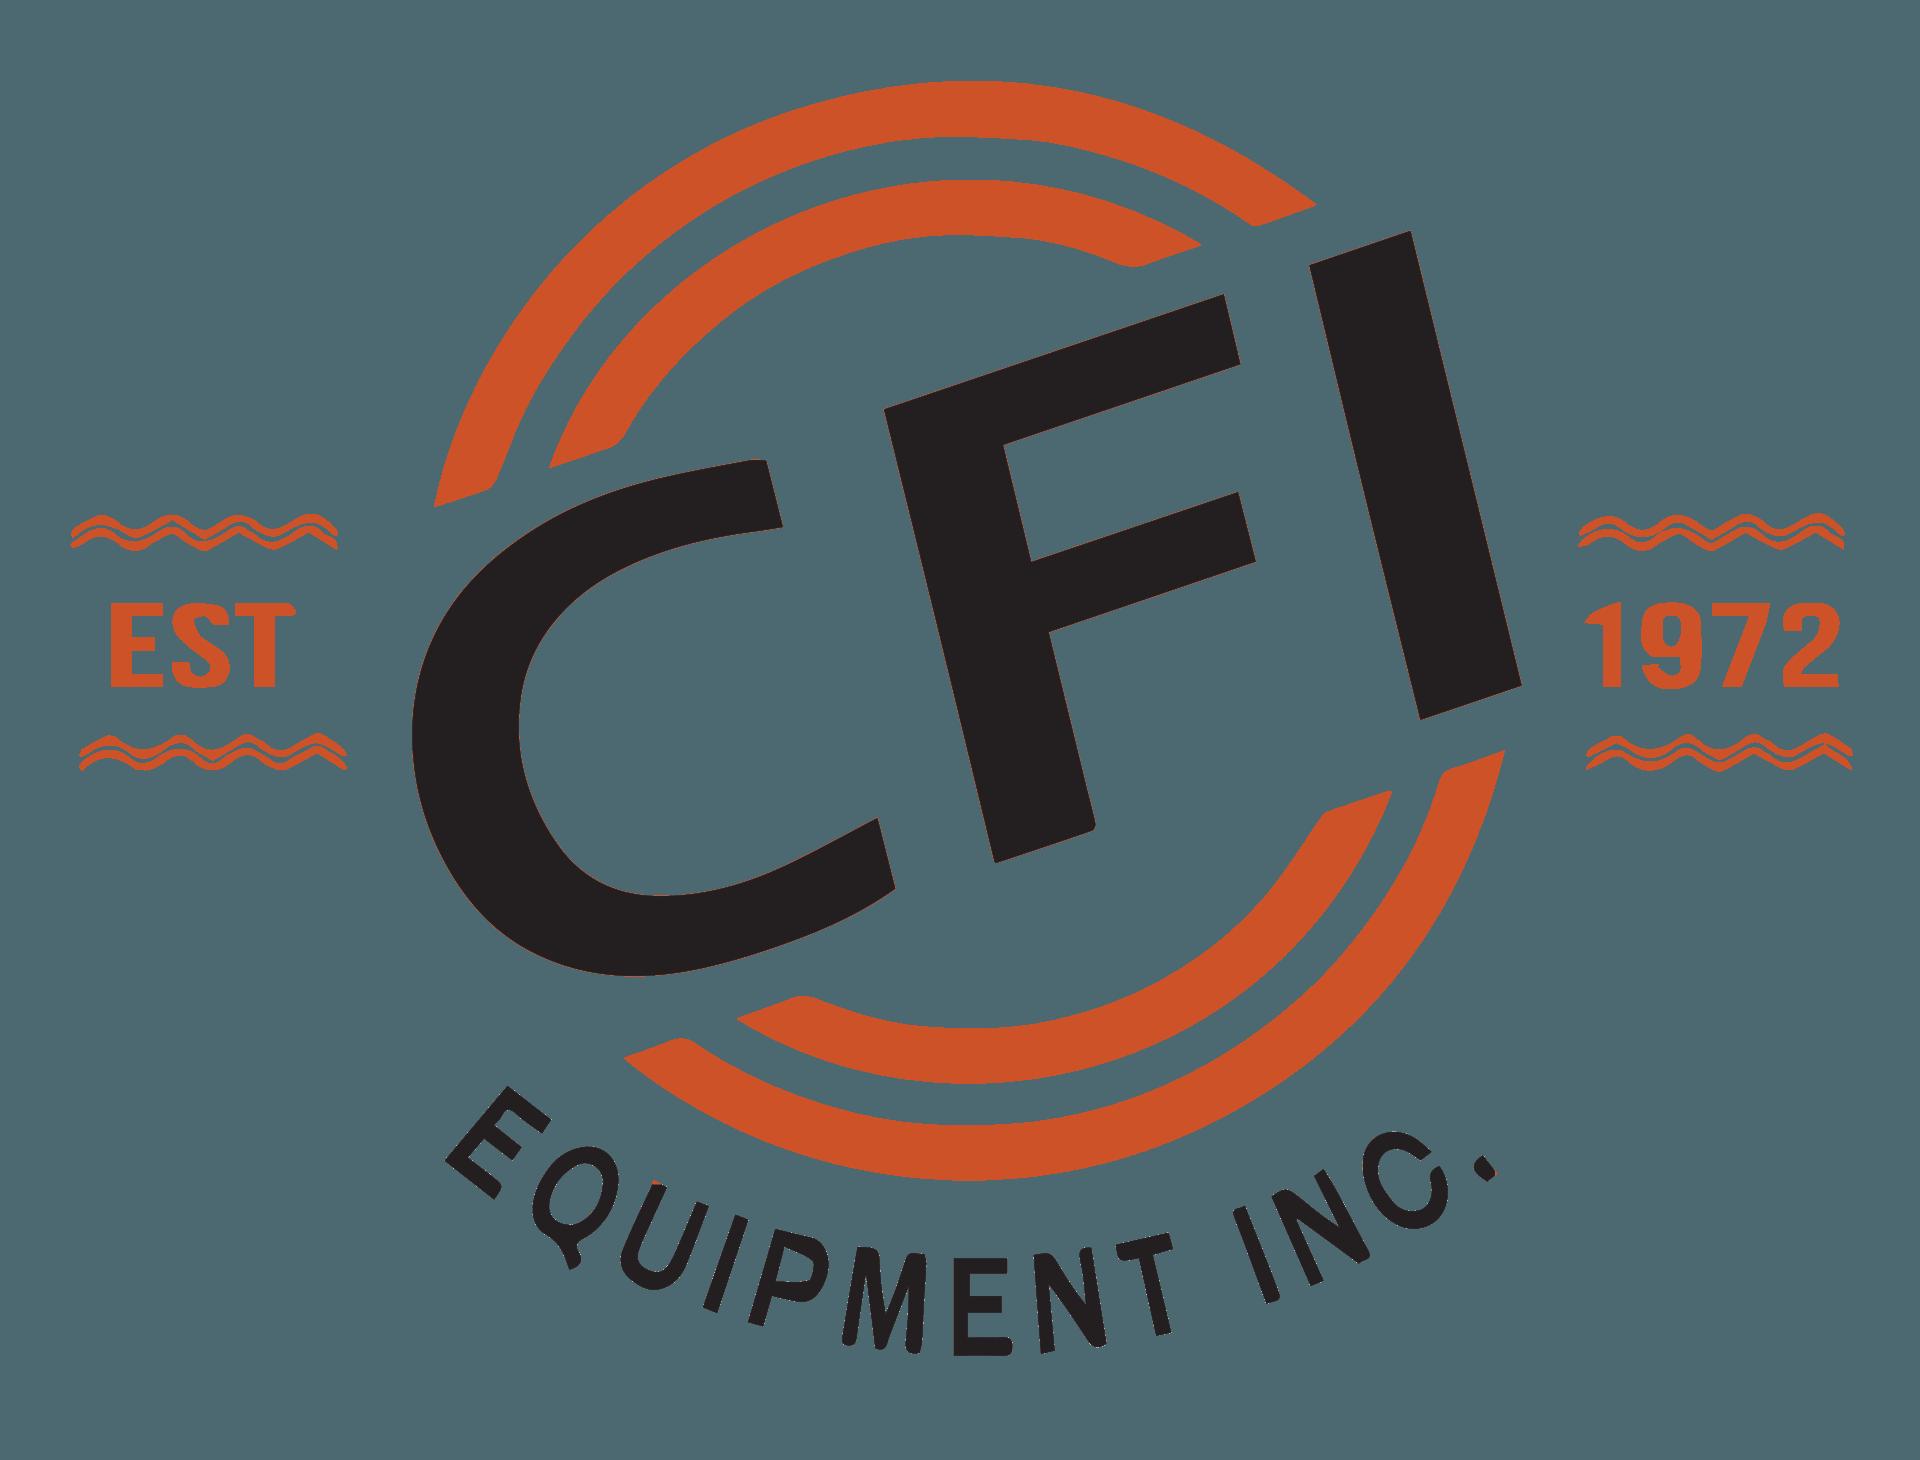 Cfi clipart image royalty free download CFI Specials image royalty free download